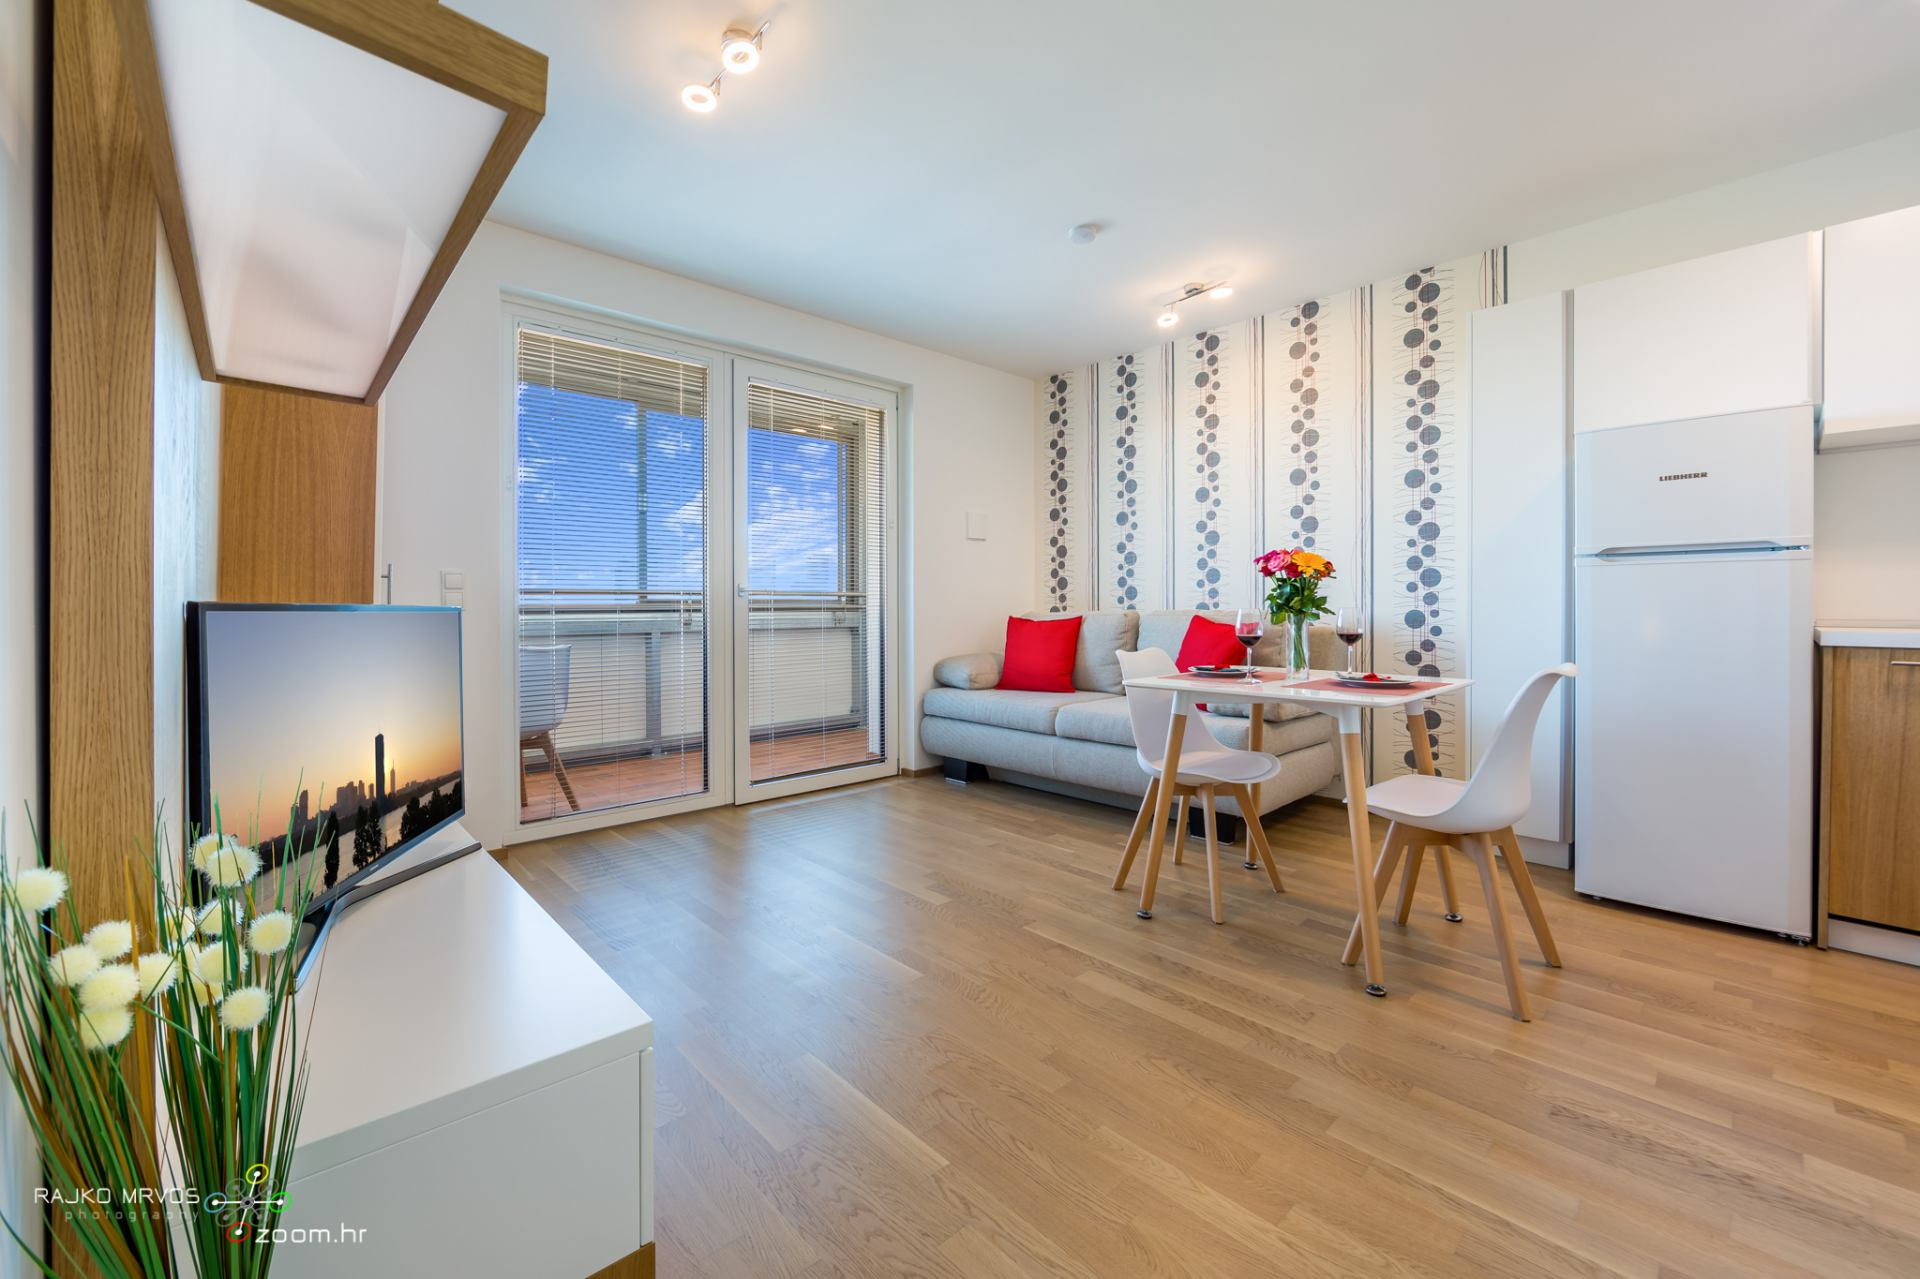 fotografiranje-interijera-fotograf-eksterijera-apartmana-vila-kuca-apartman-Beč-7